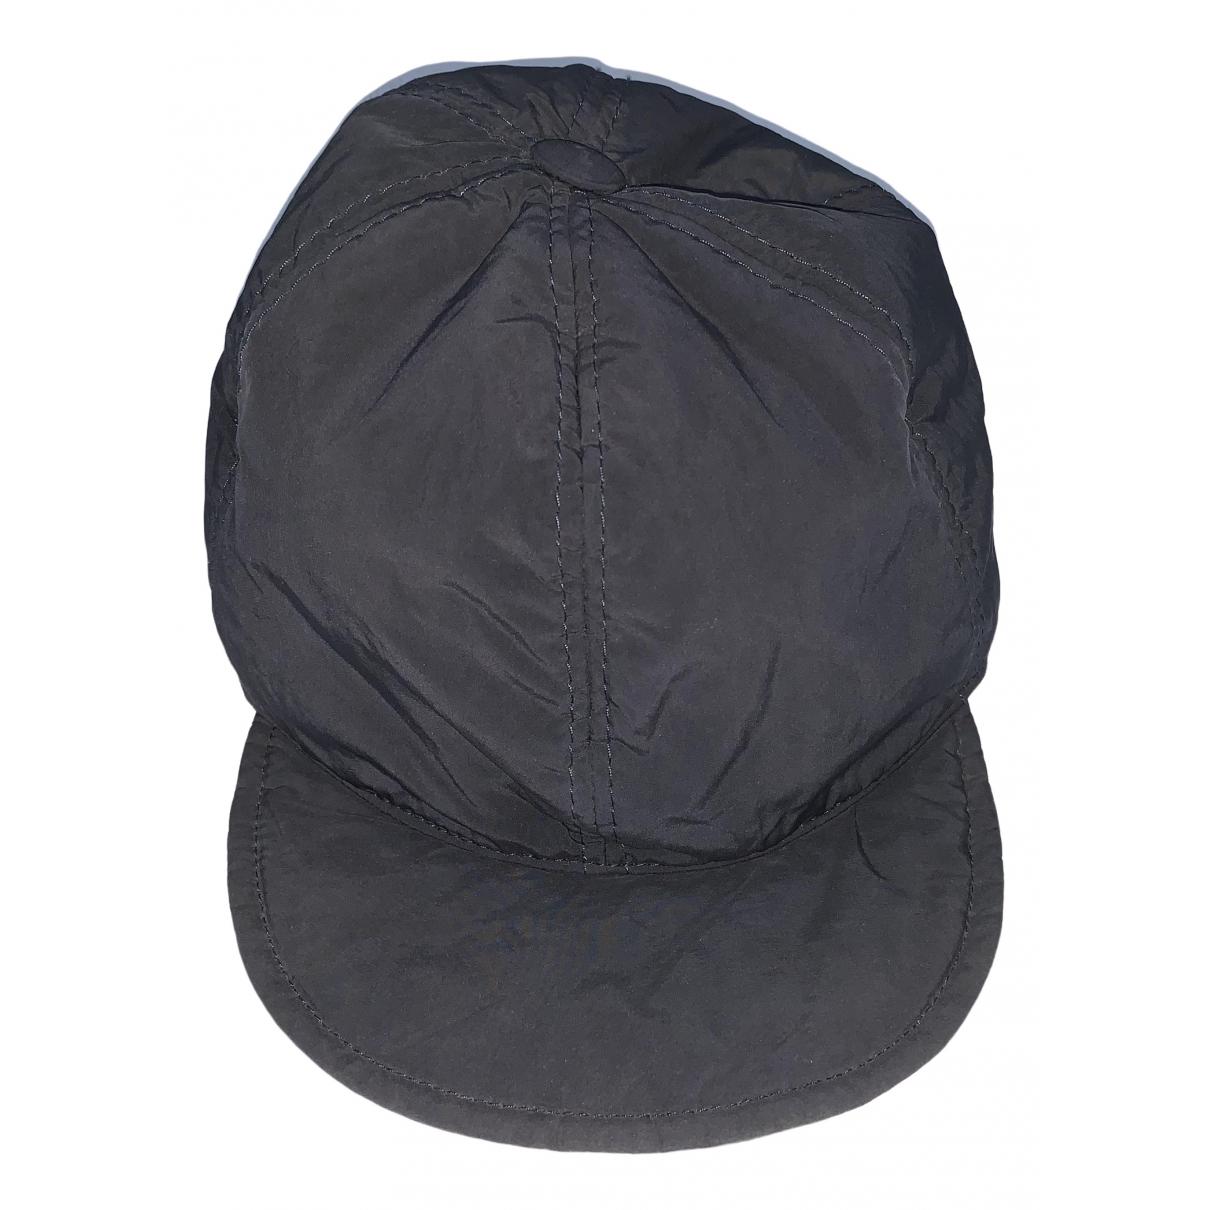 Lanvin \N Navy hat & pull on hat for Men 58 cm